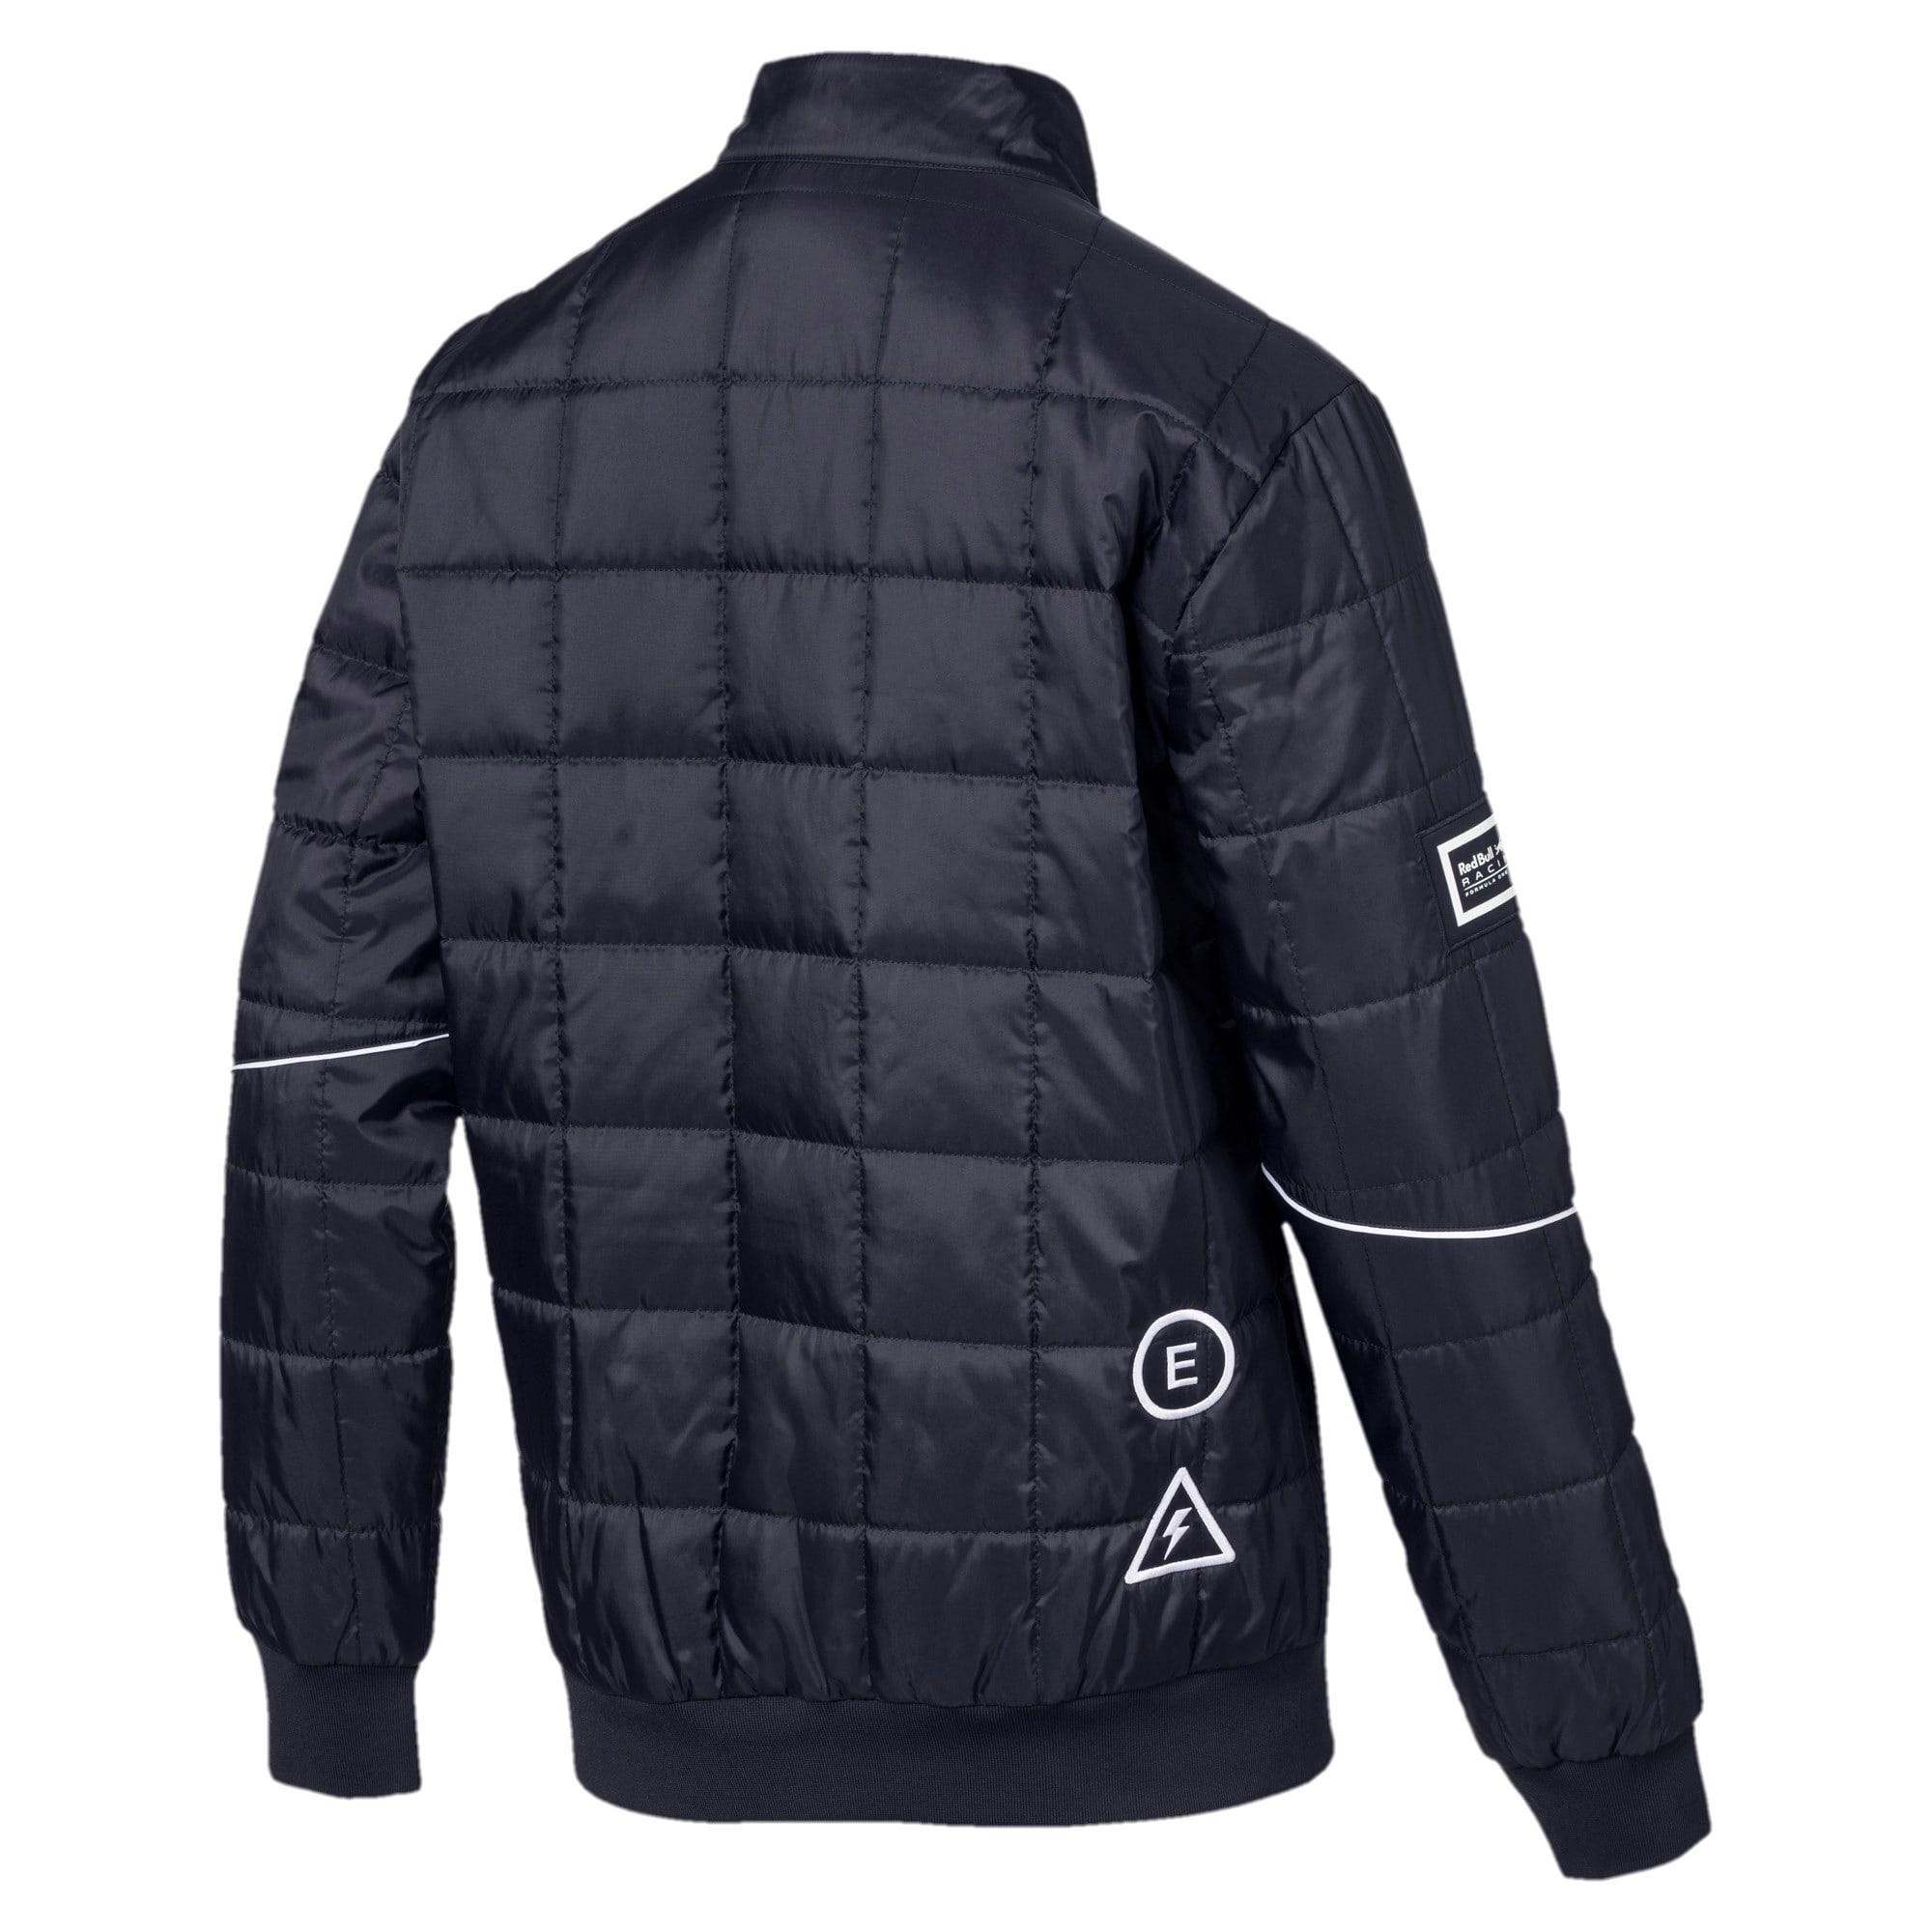 Thumbnail 2 of Red Bull Racing Speedcat Evo Zip-Up Men's Jacket, NIGHT SKY, medium-IND